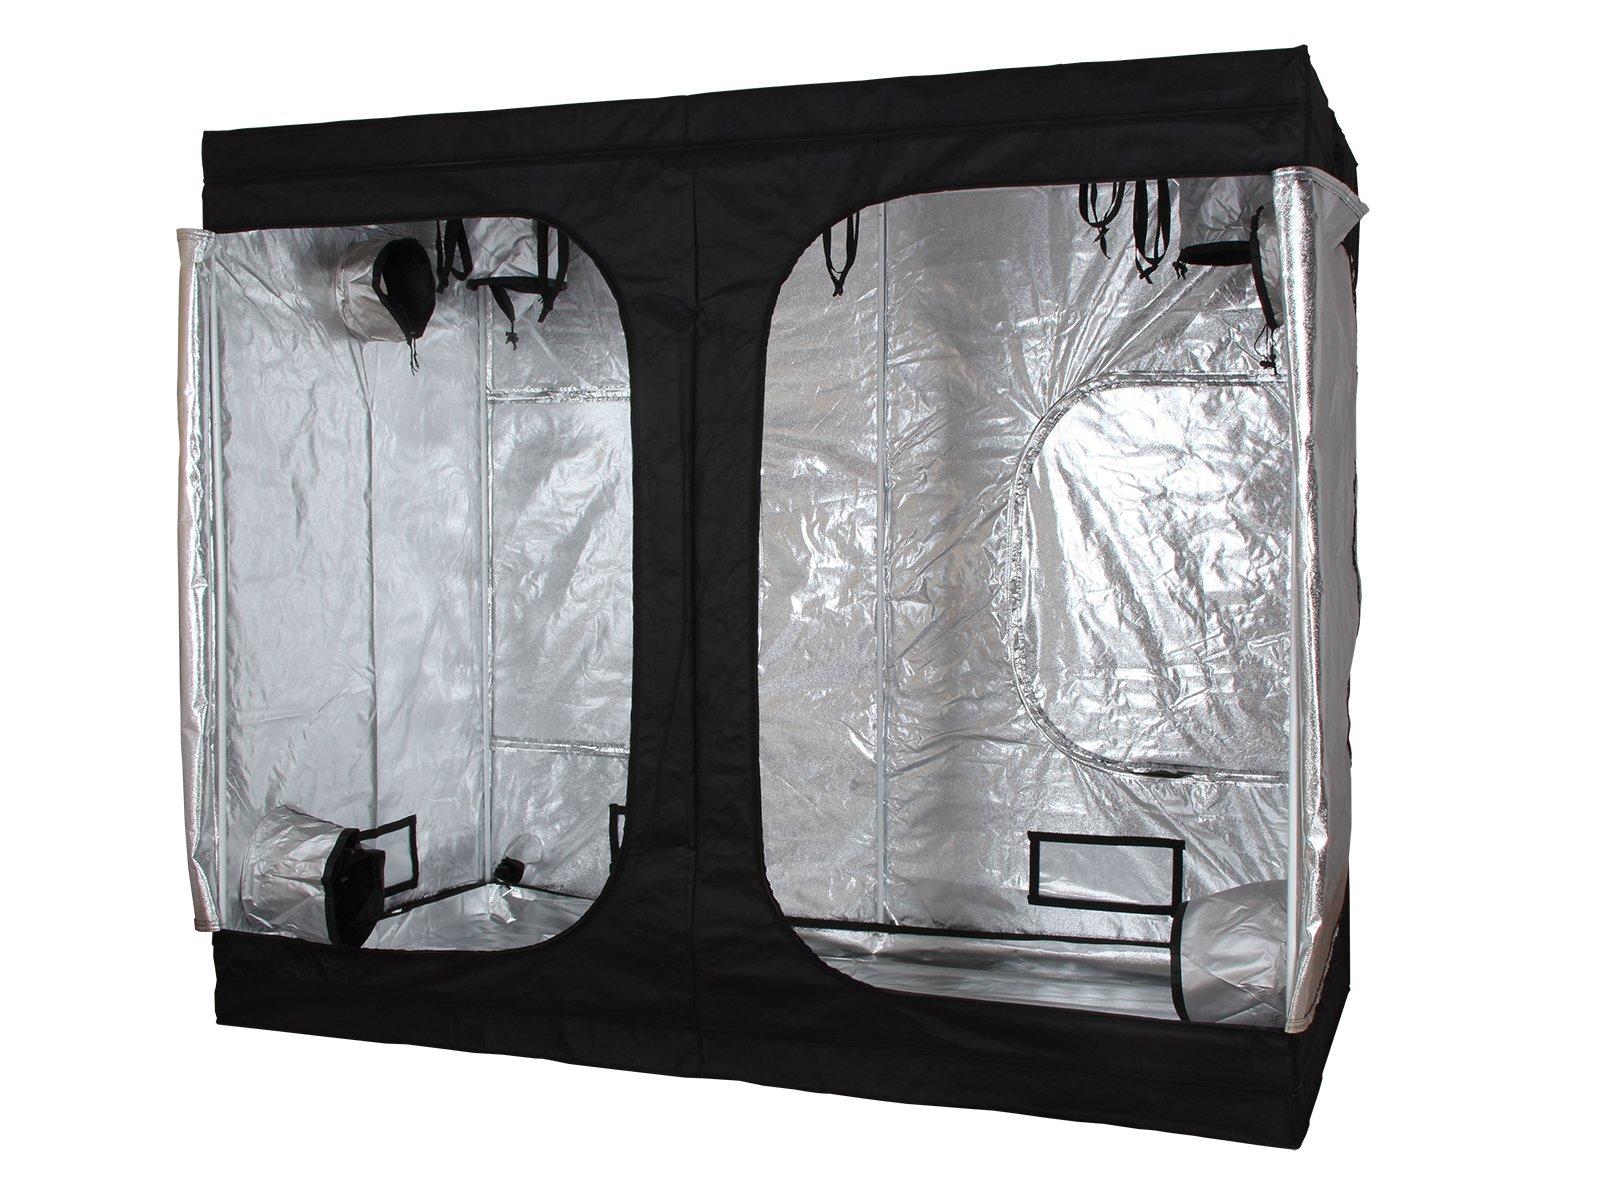 96''x48''x84'' Indoor Grow Tent Room 100% Reflective Mylar Hydroponic Non Toxic Hut 600D 8'x4'x7' HX-009684-P